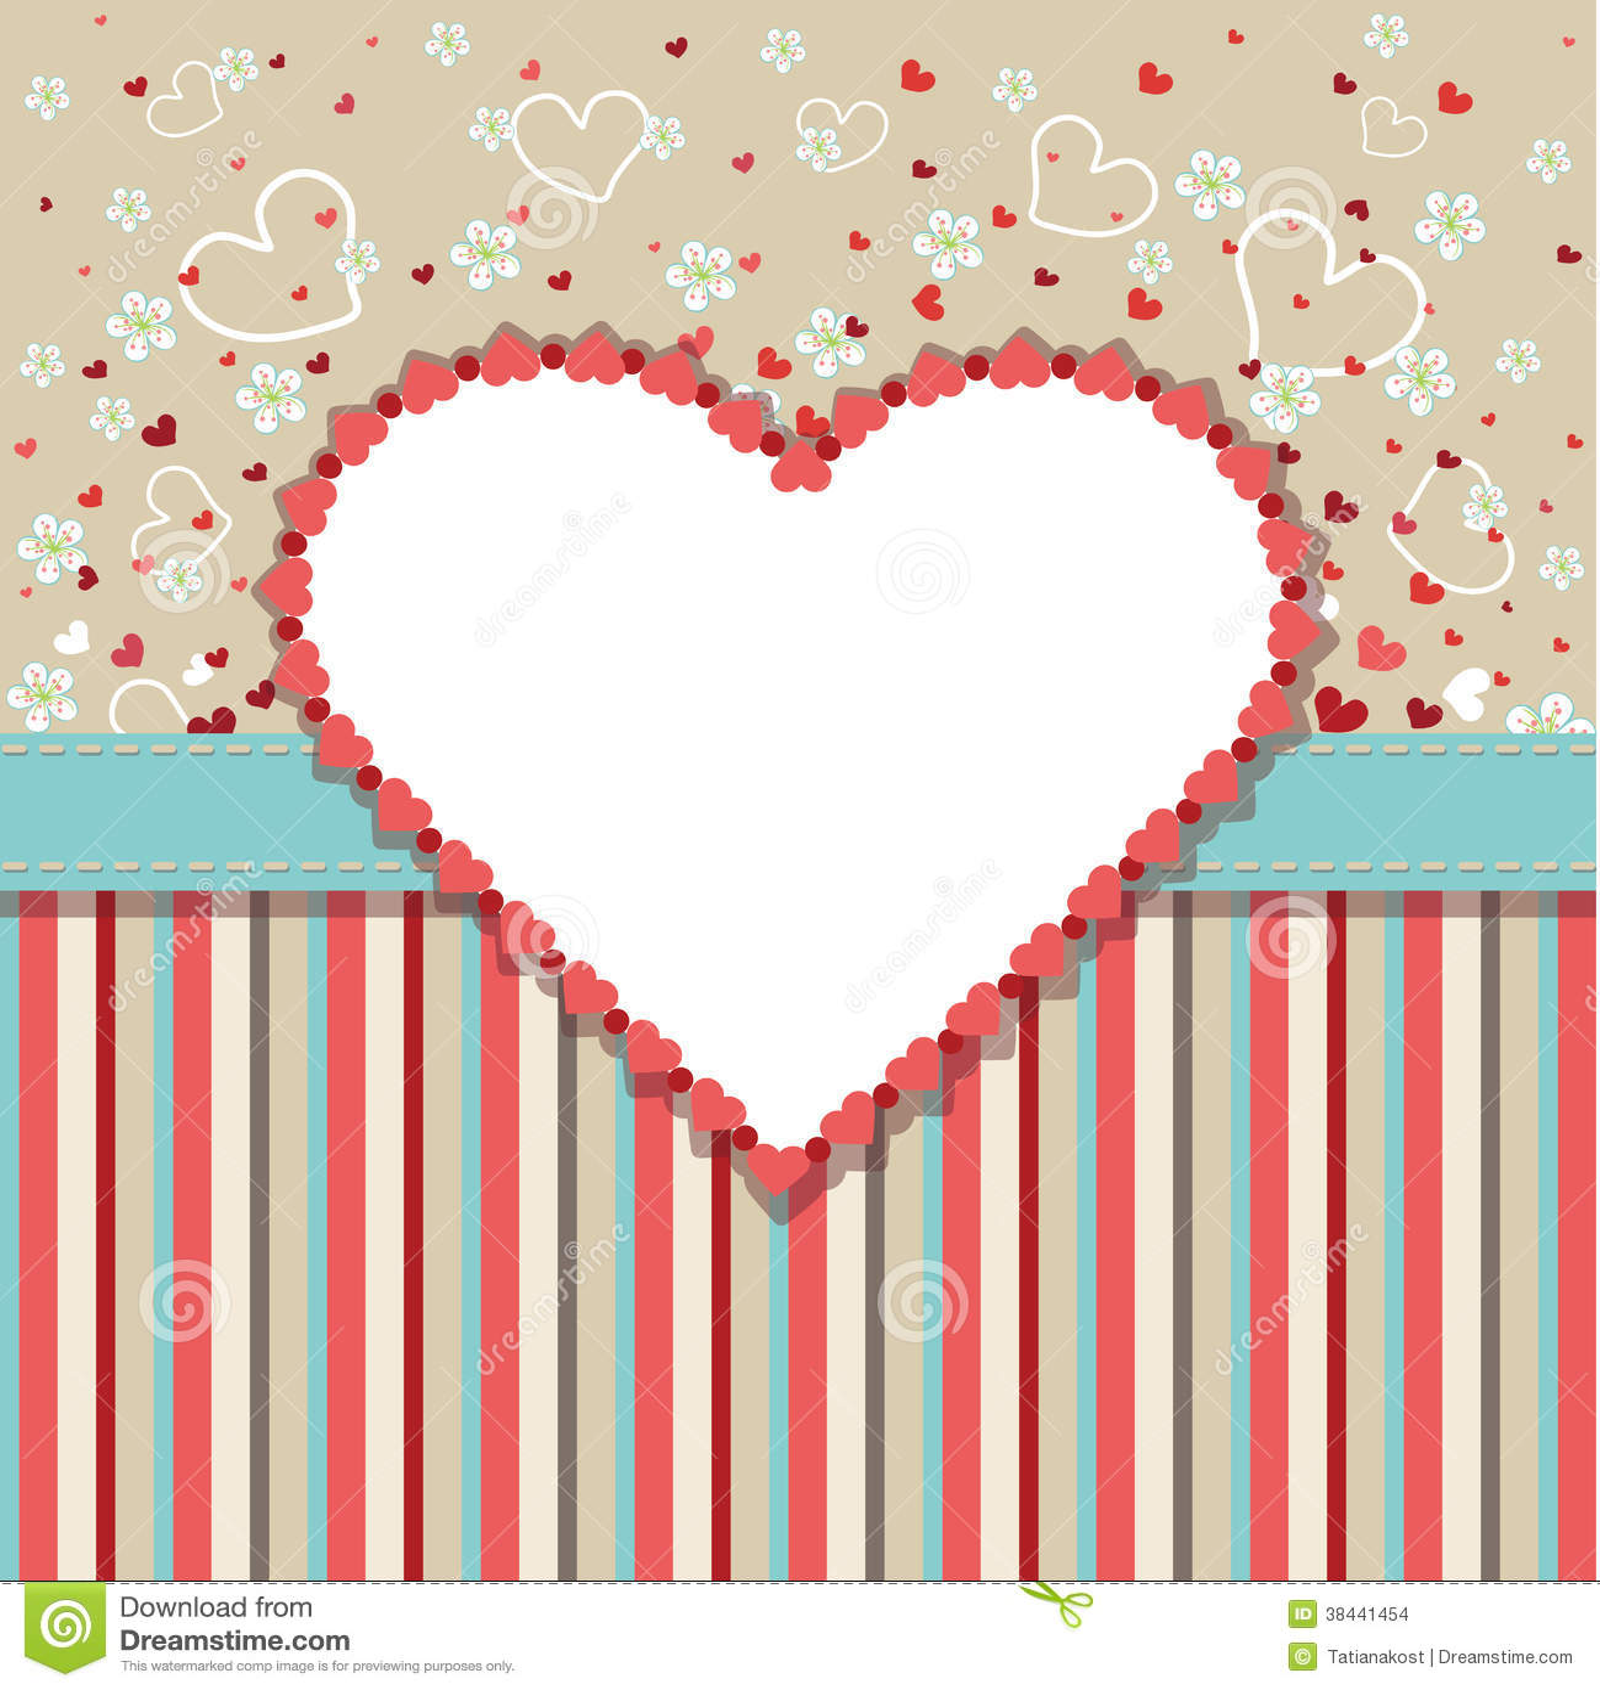 vintage wedding design template with hearts flower illustration